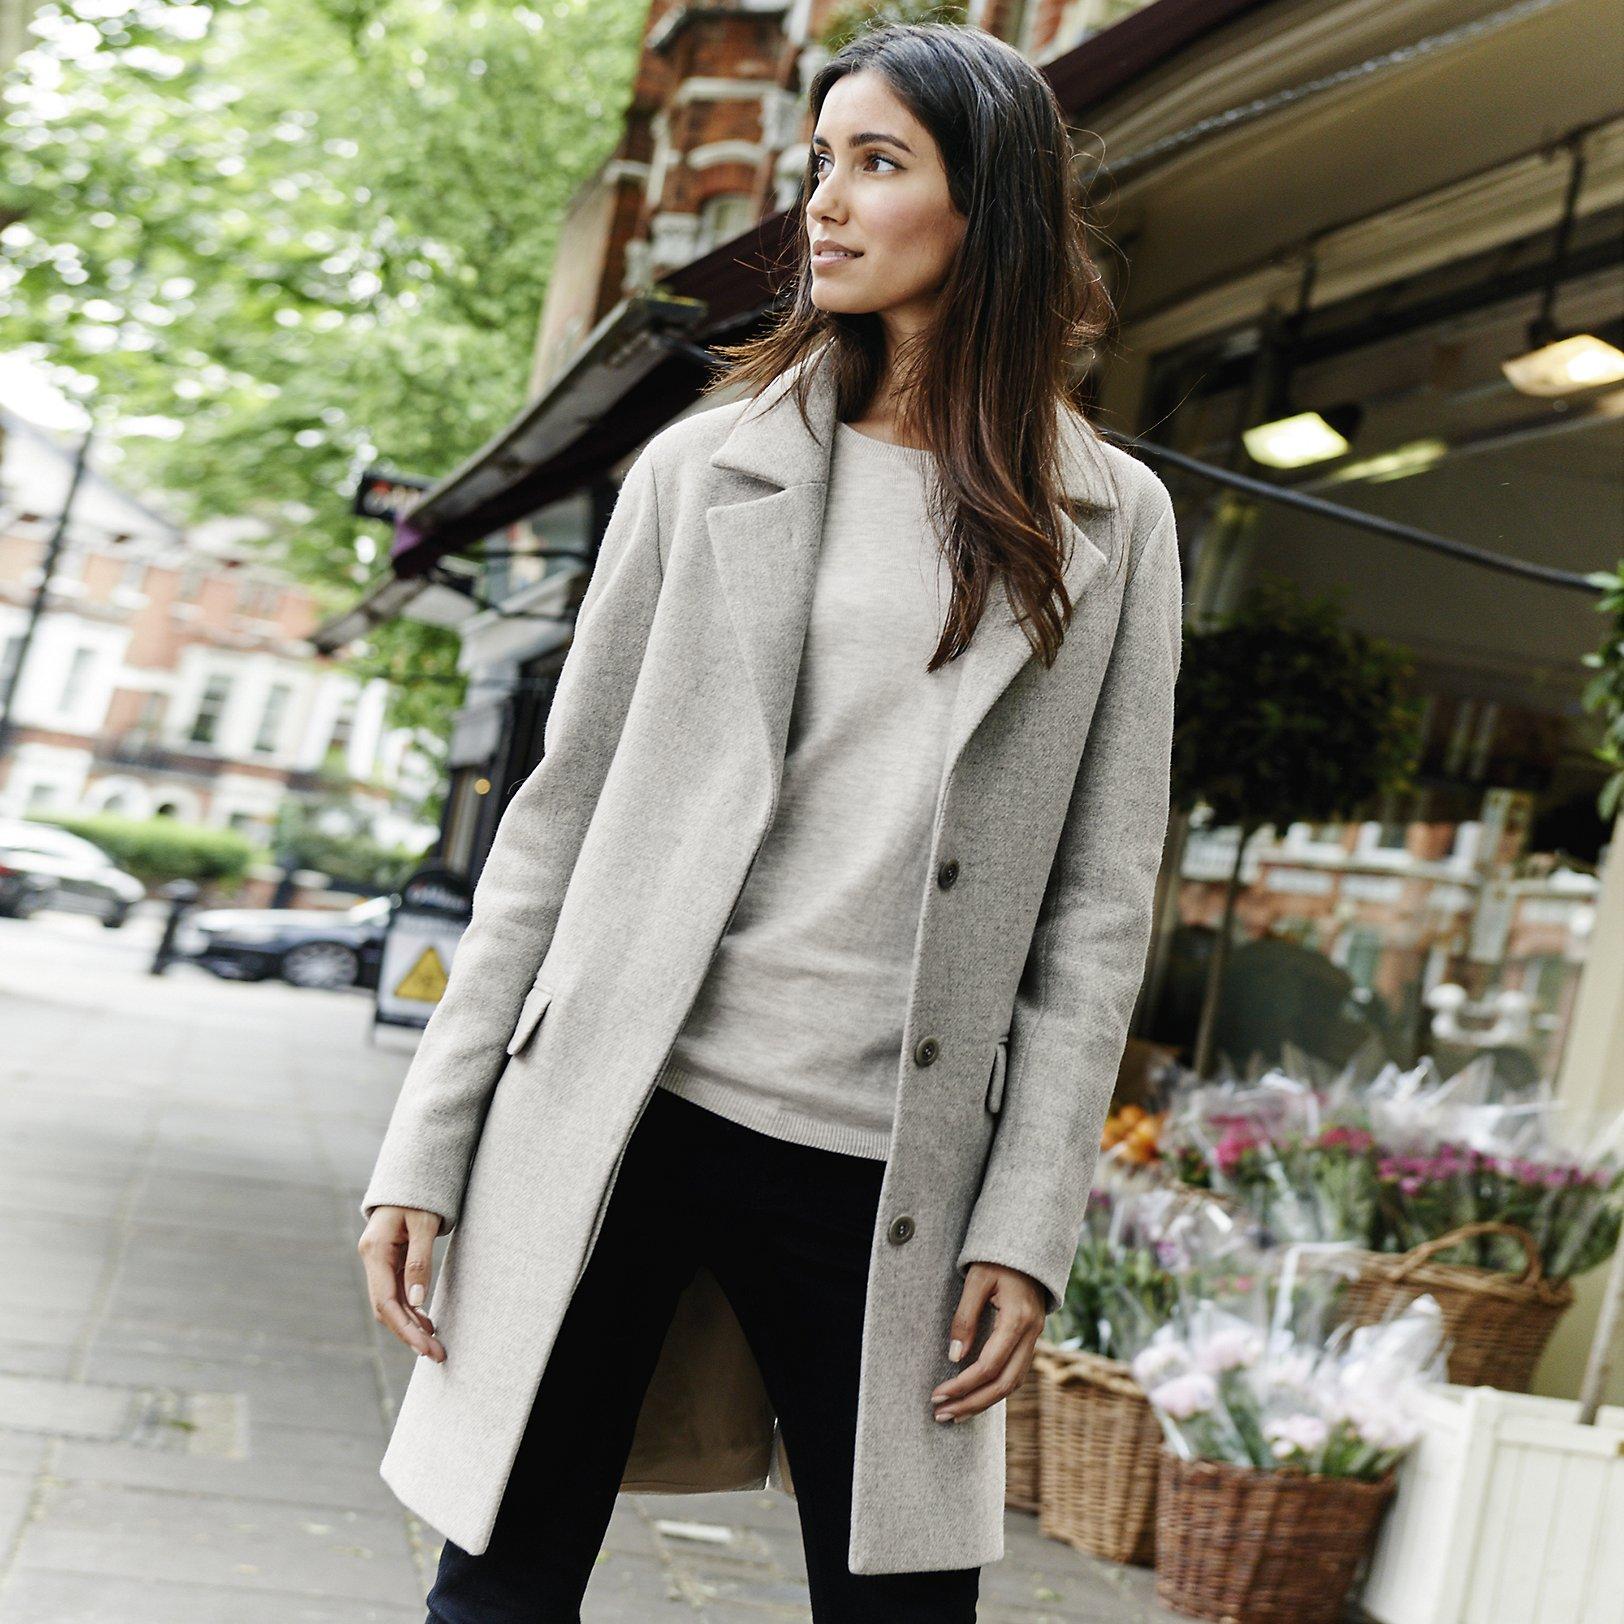 Revere Coat | Clothing | The White Company US